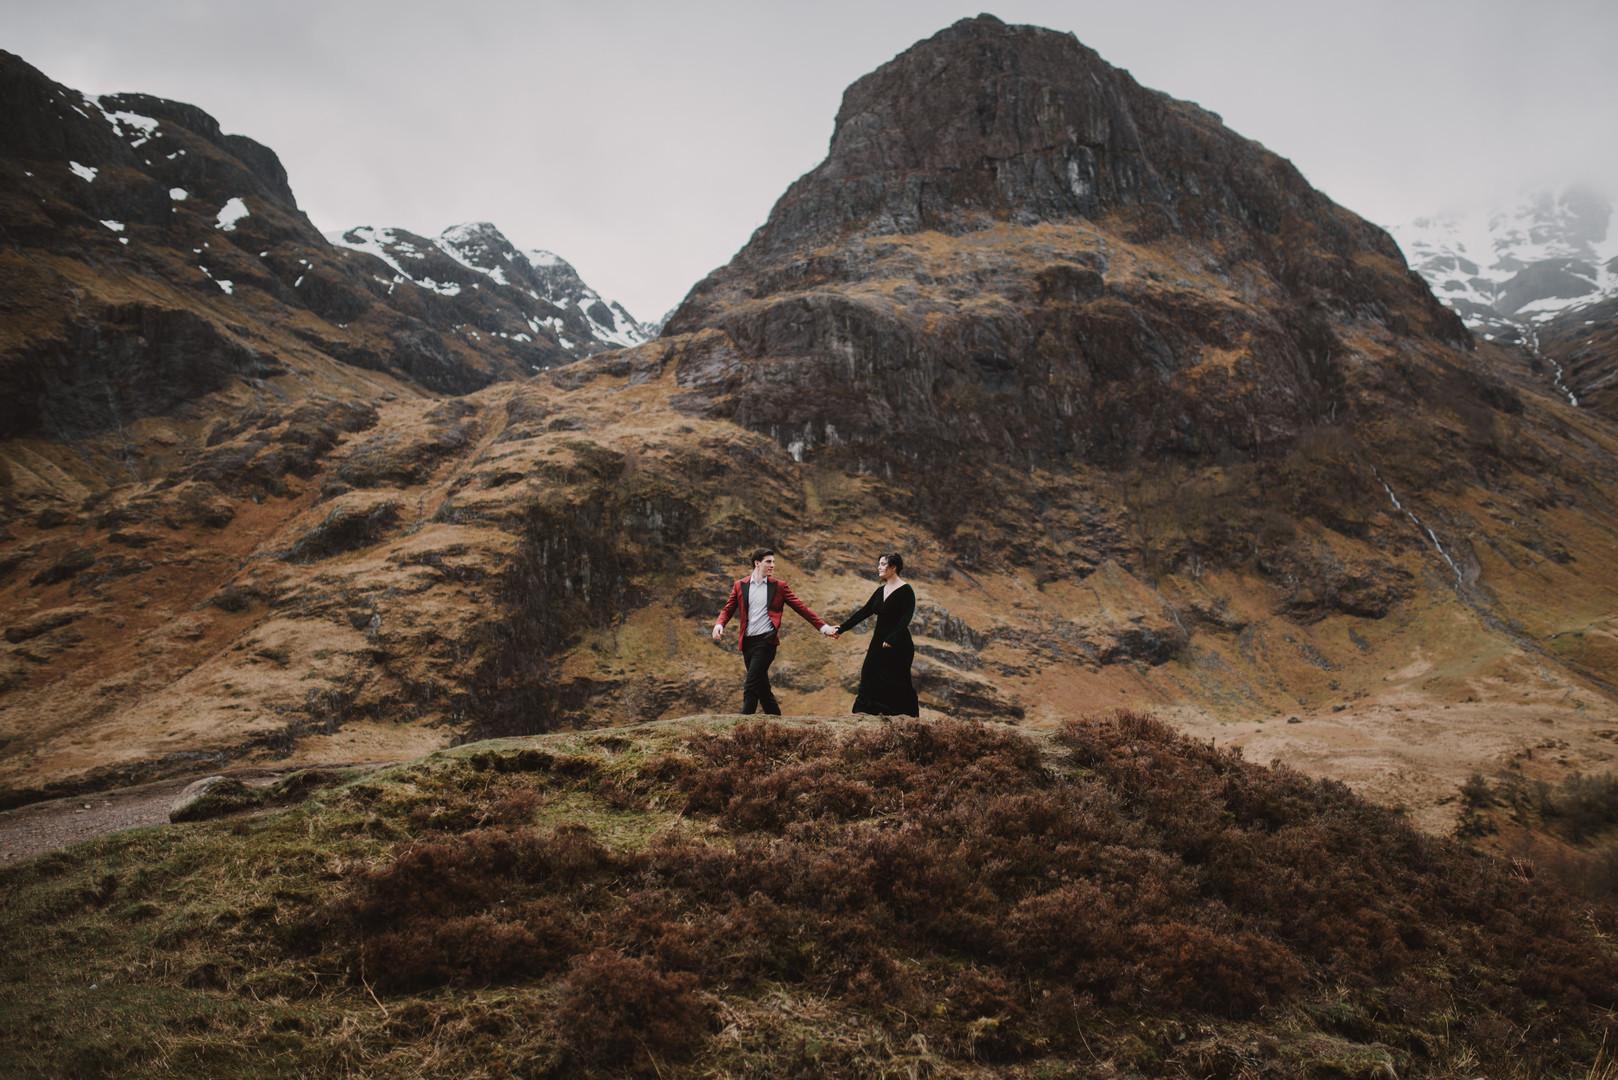 Schotland_elopment_anoukfotografeert-6.j